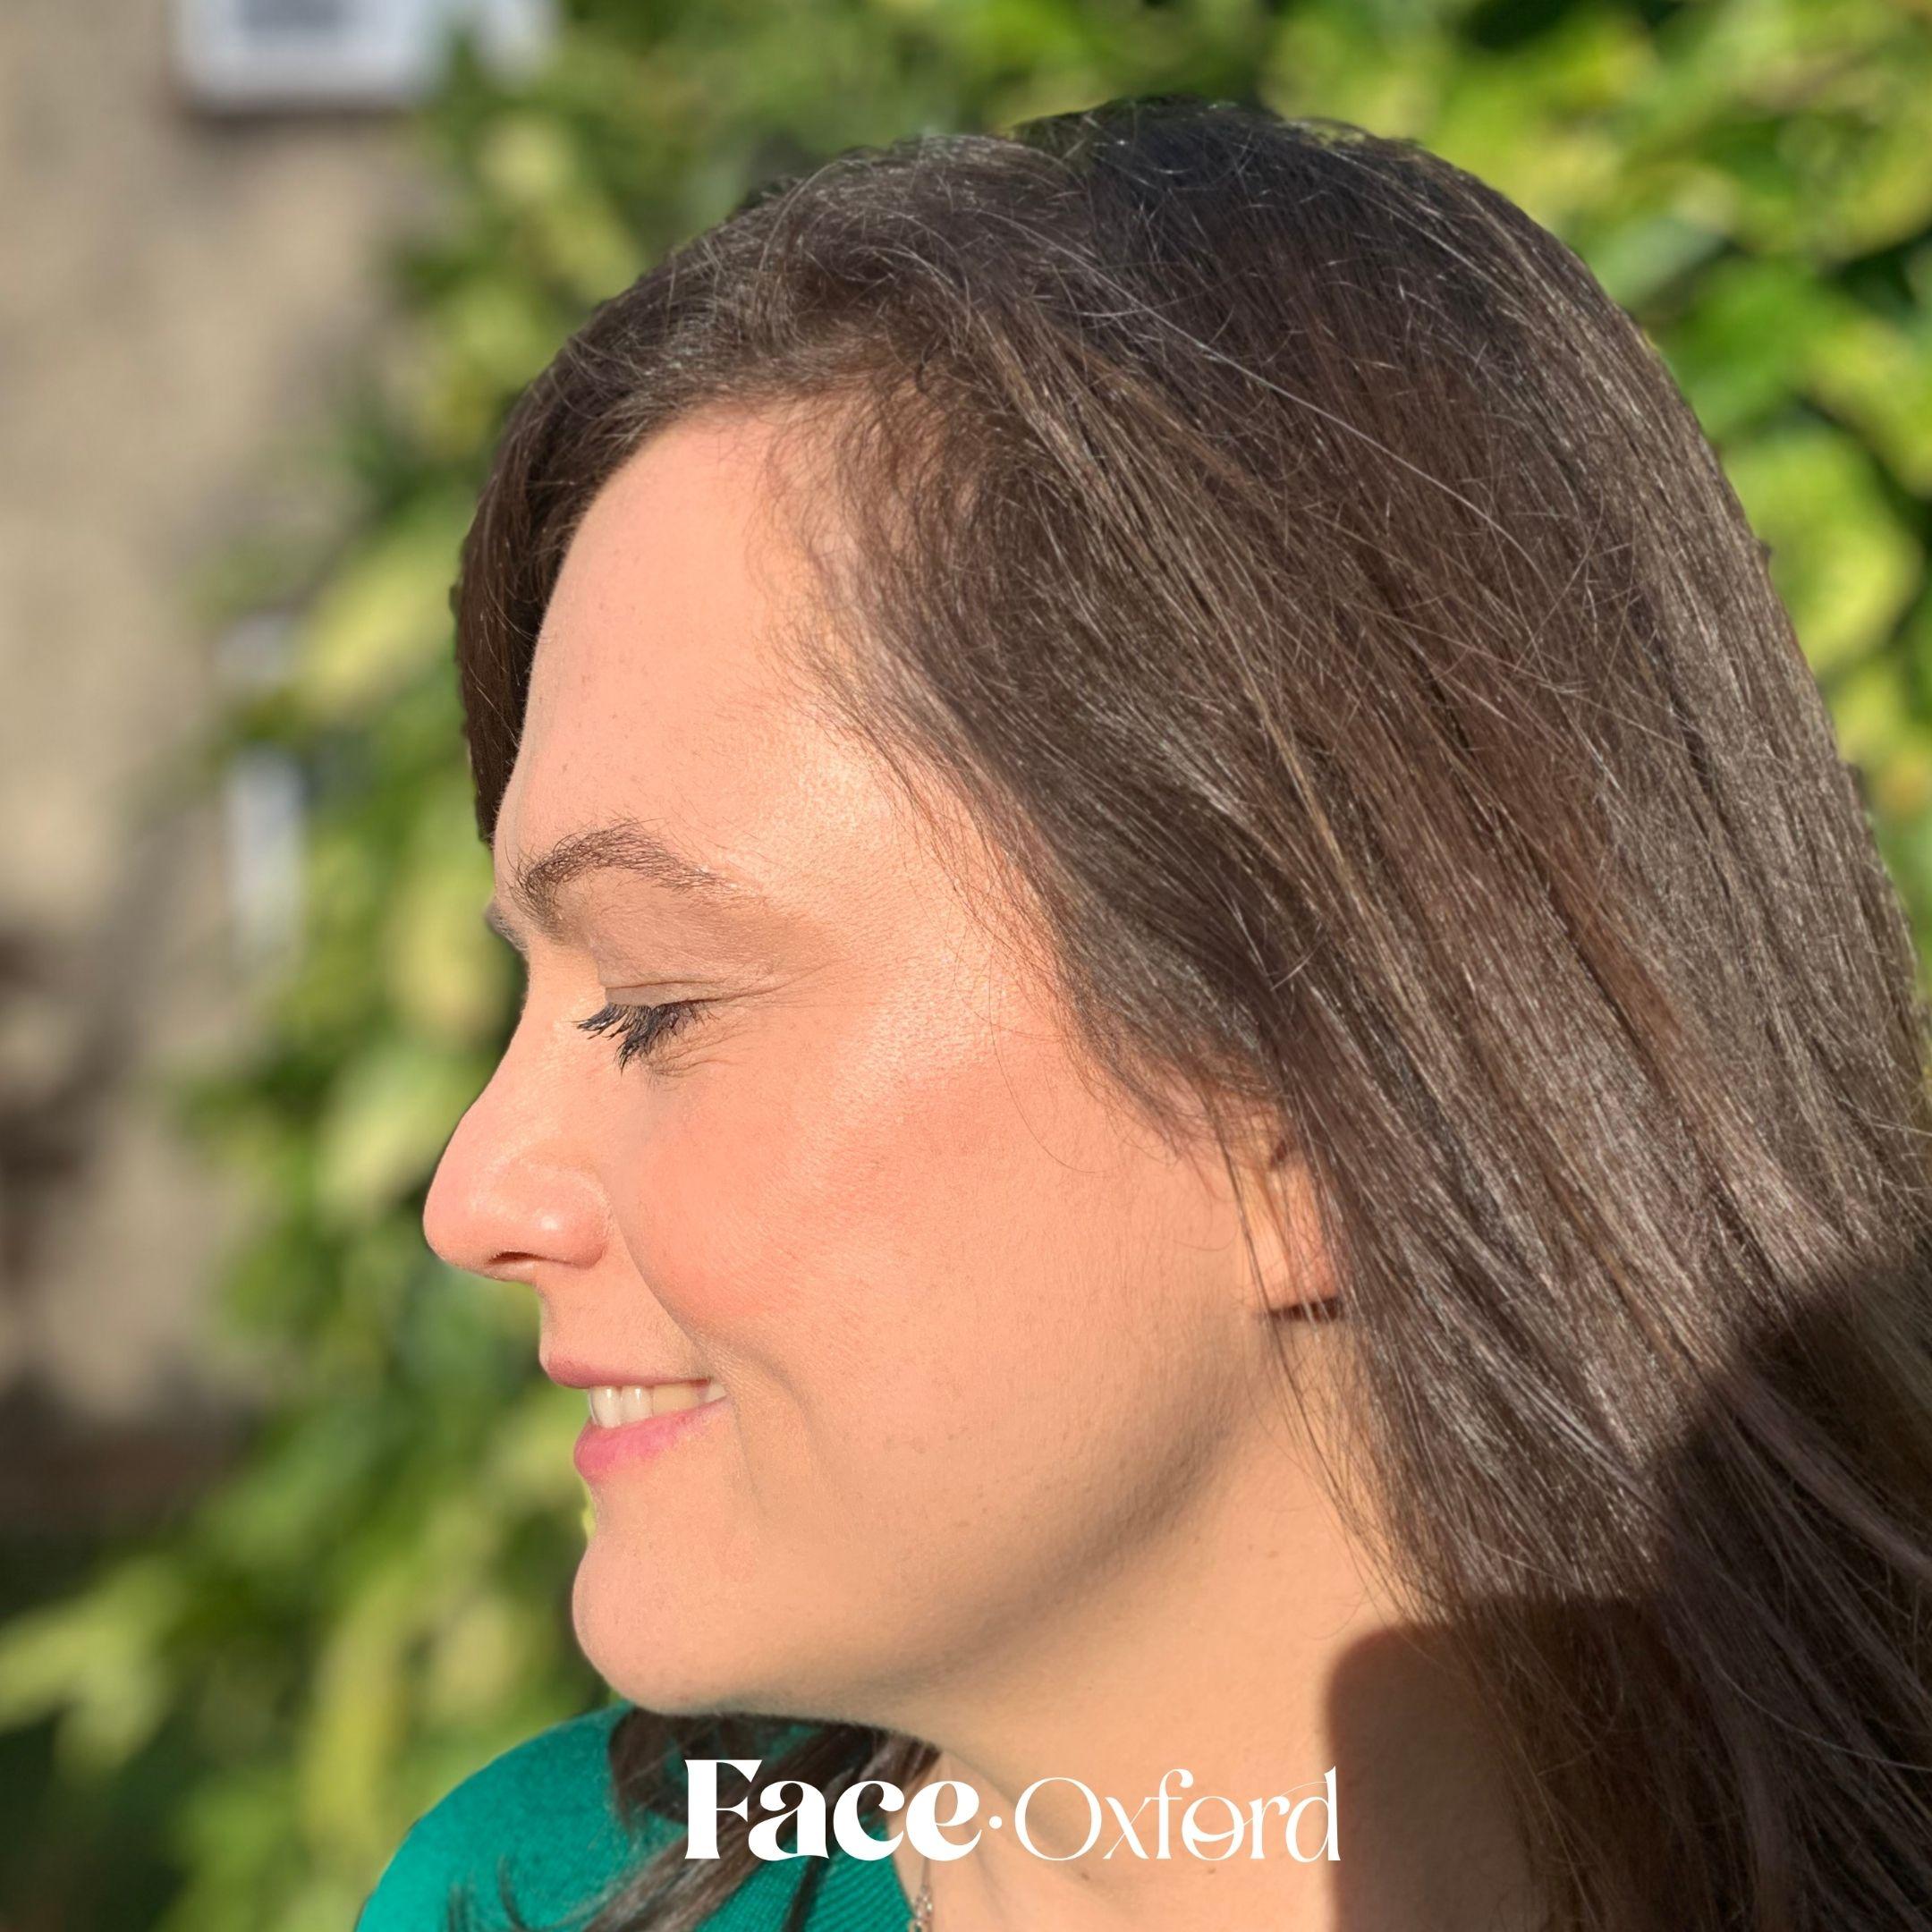 Face Oxford Kat Cane